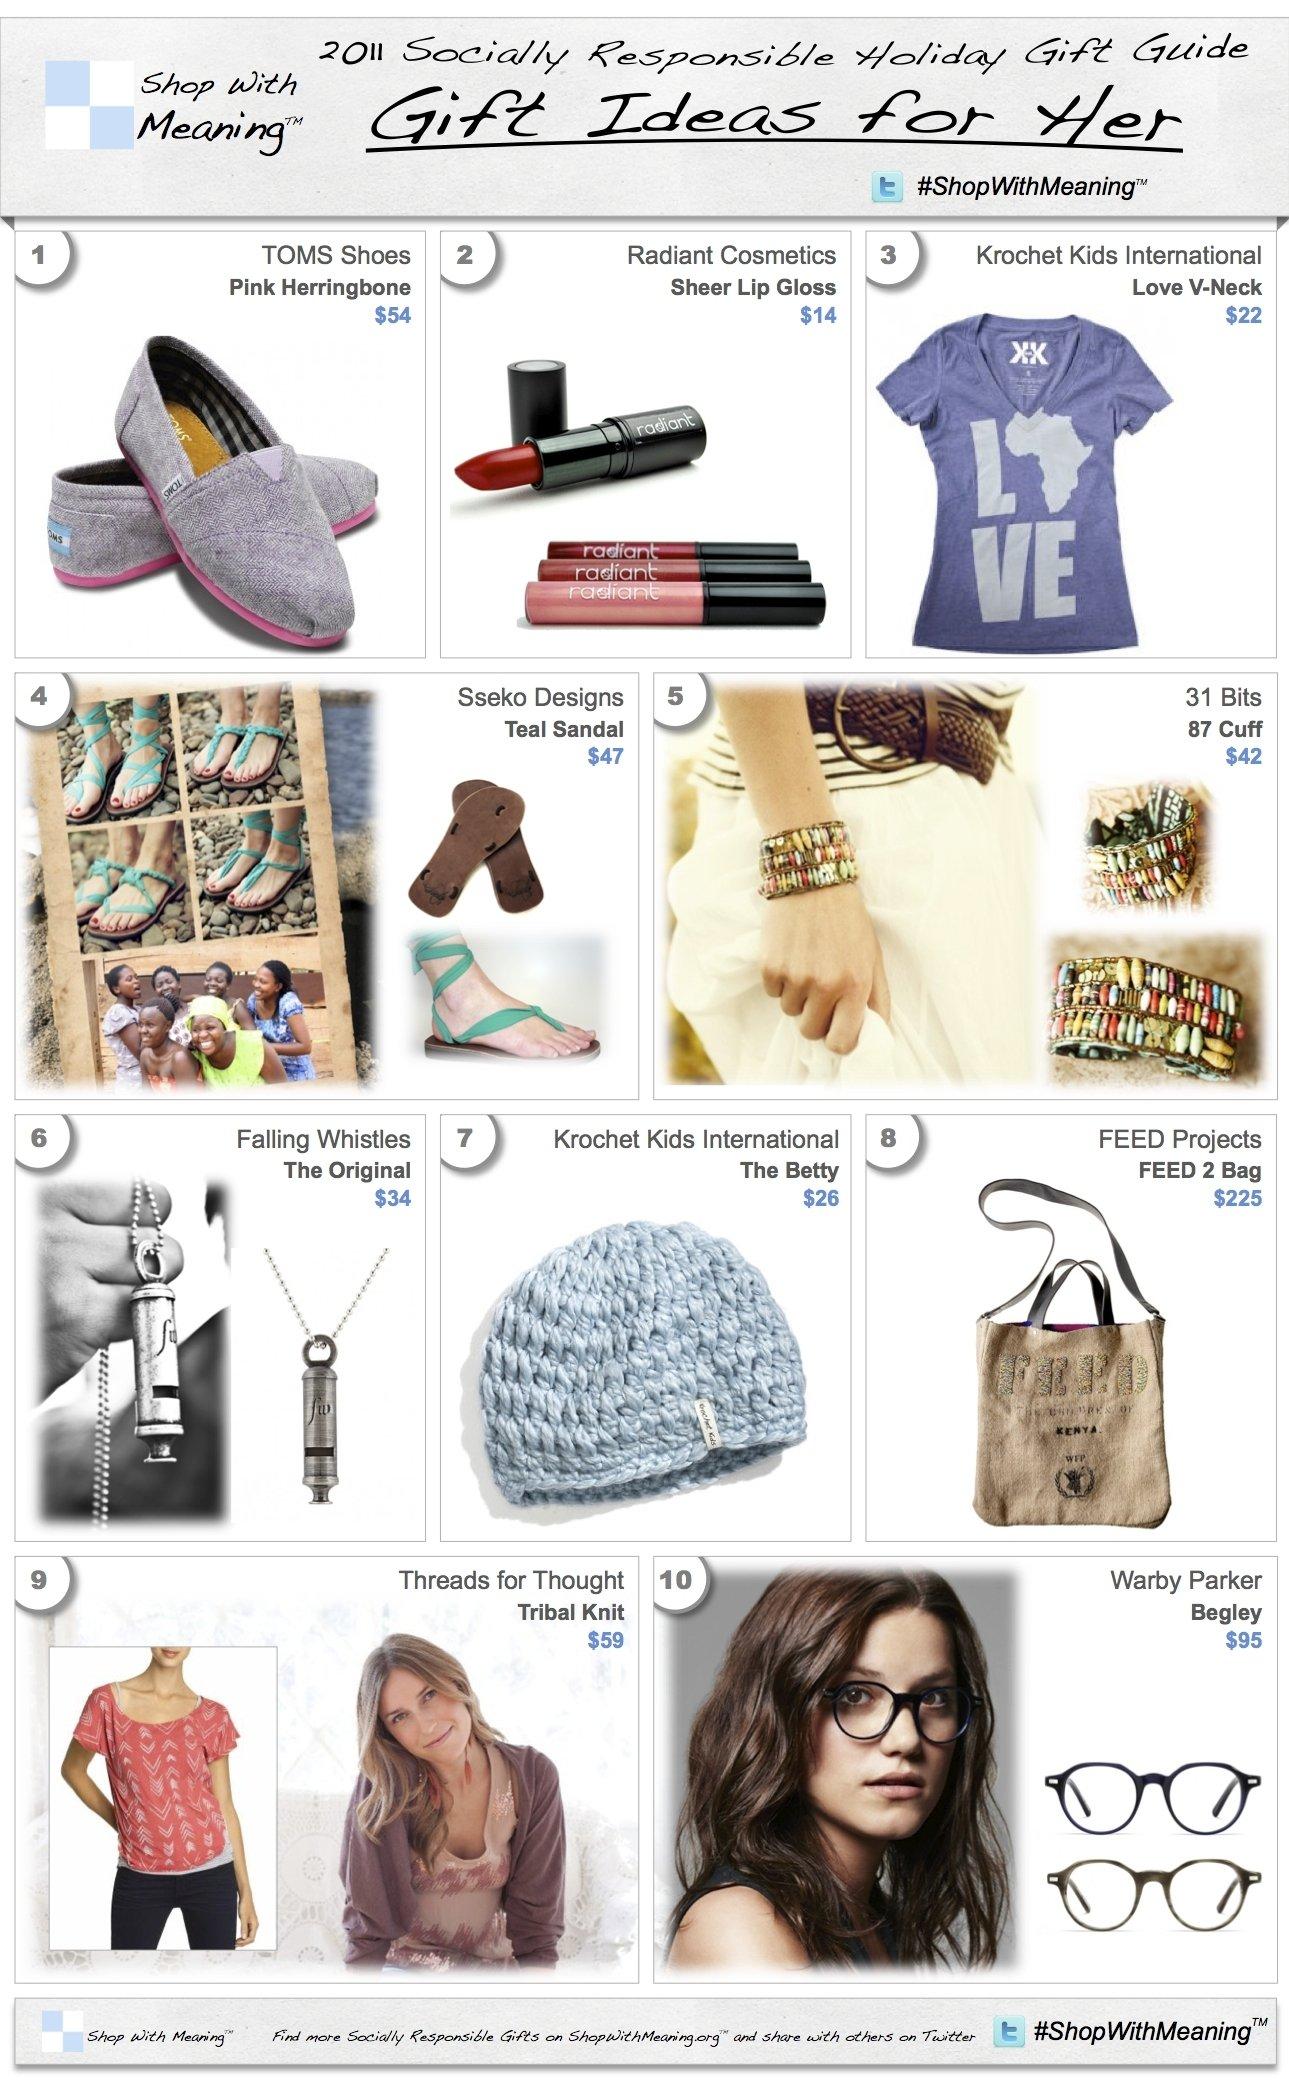 10 Gorgeous Xmas Gift Ideas For Wife 2011 christmas gift ideas women socially responsible christmas 3 2021